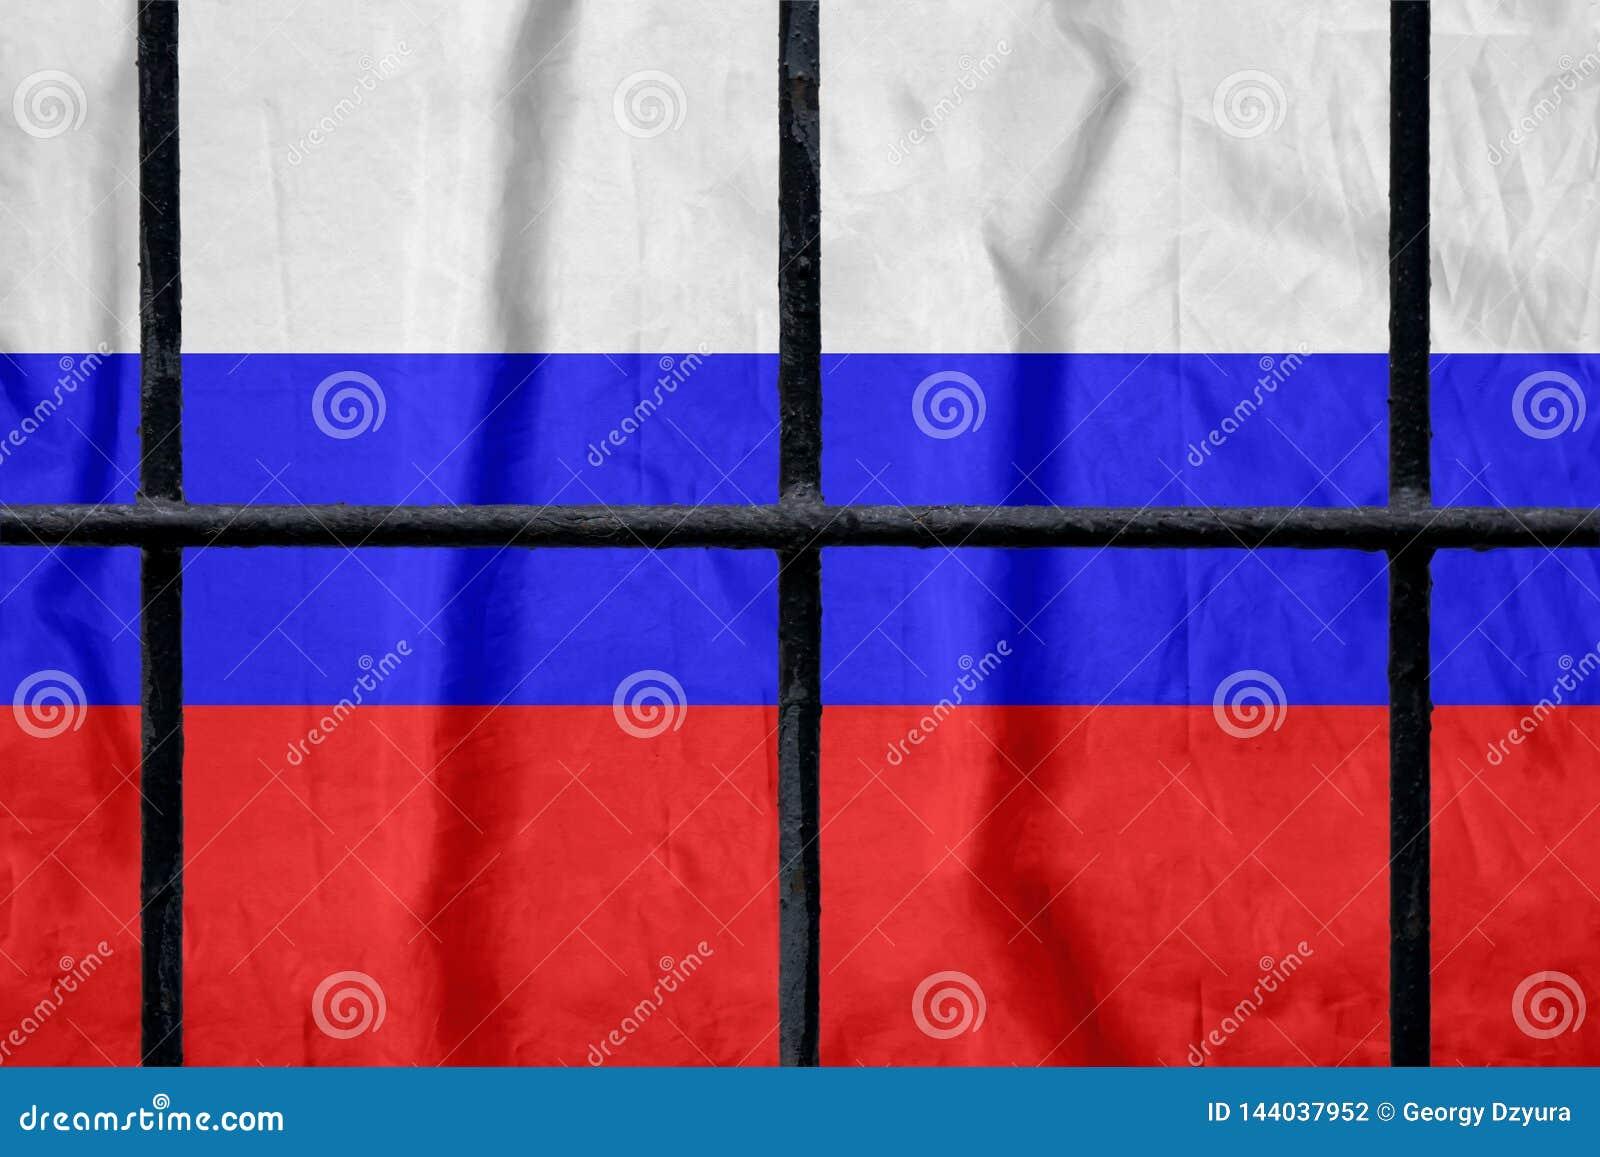 Russian flag behind black metal prison bars